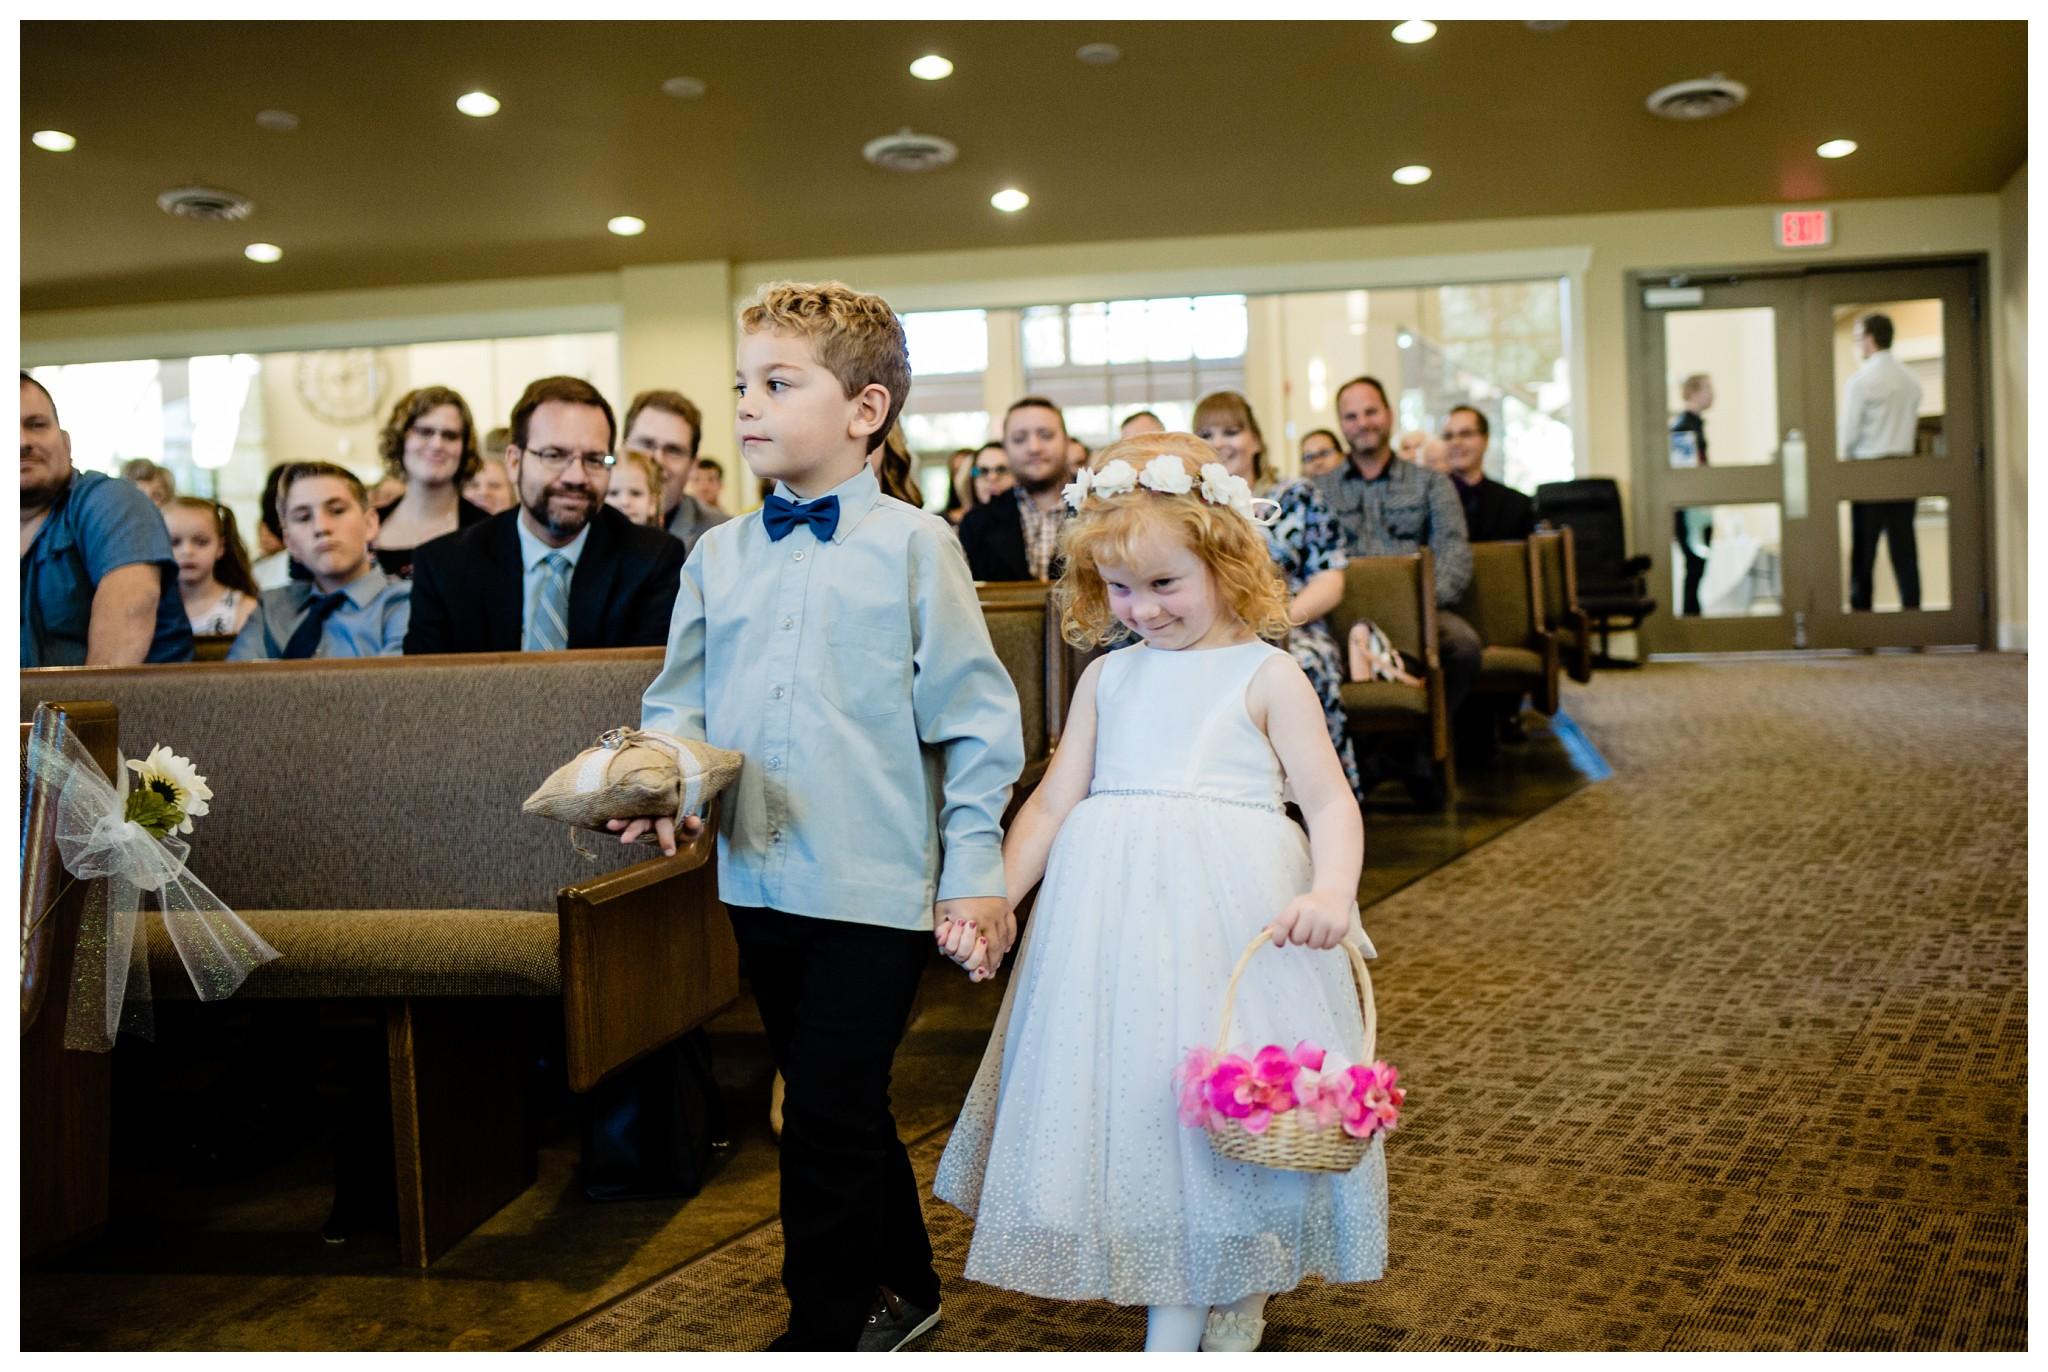 Aldergrove Park Christian Church Wedding Photography Pink Flowers Blue Bridesmaid Dress Fall_0056.jpg